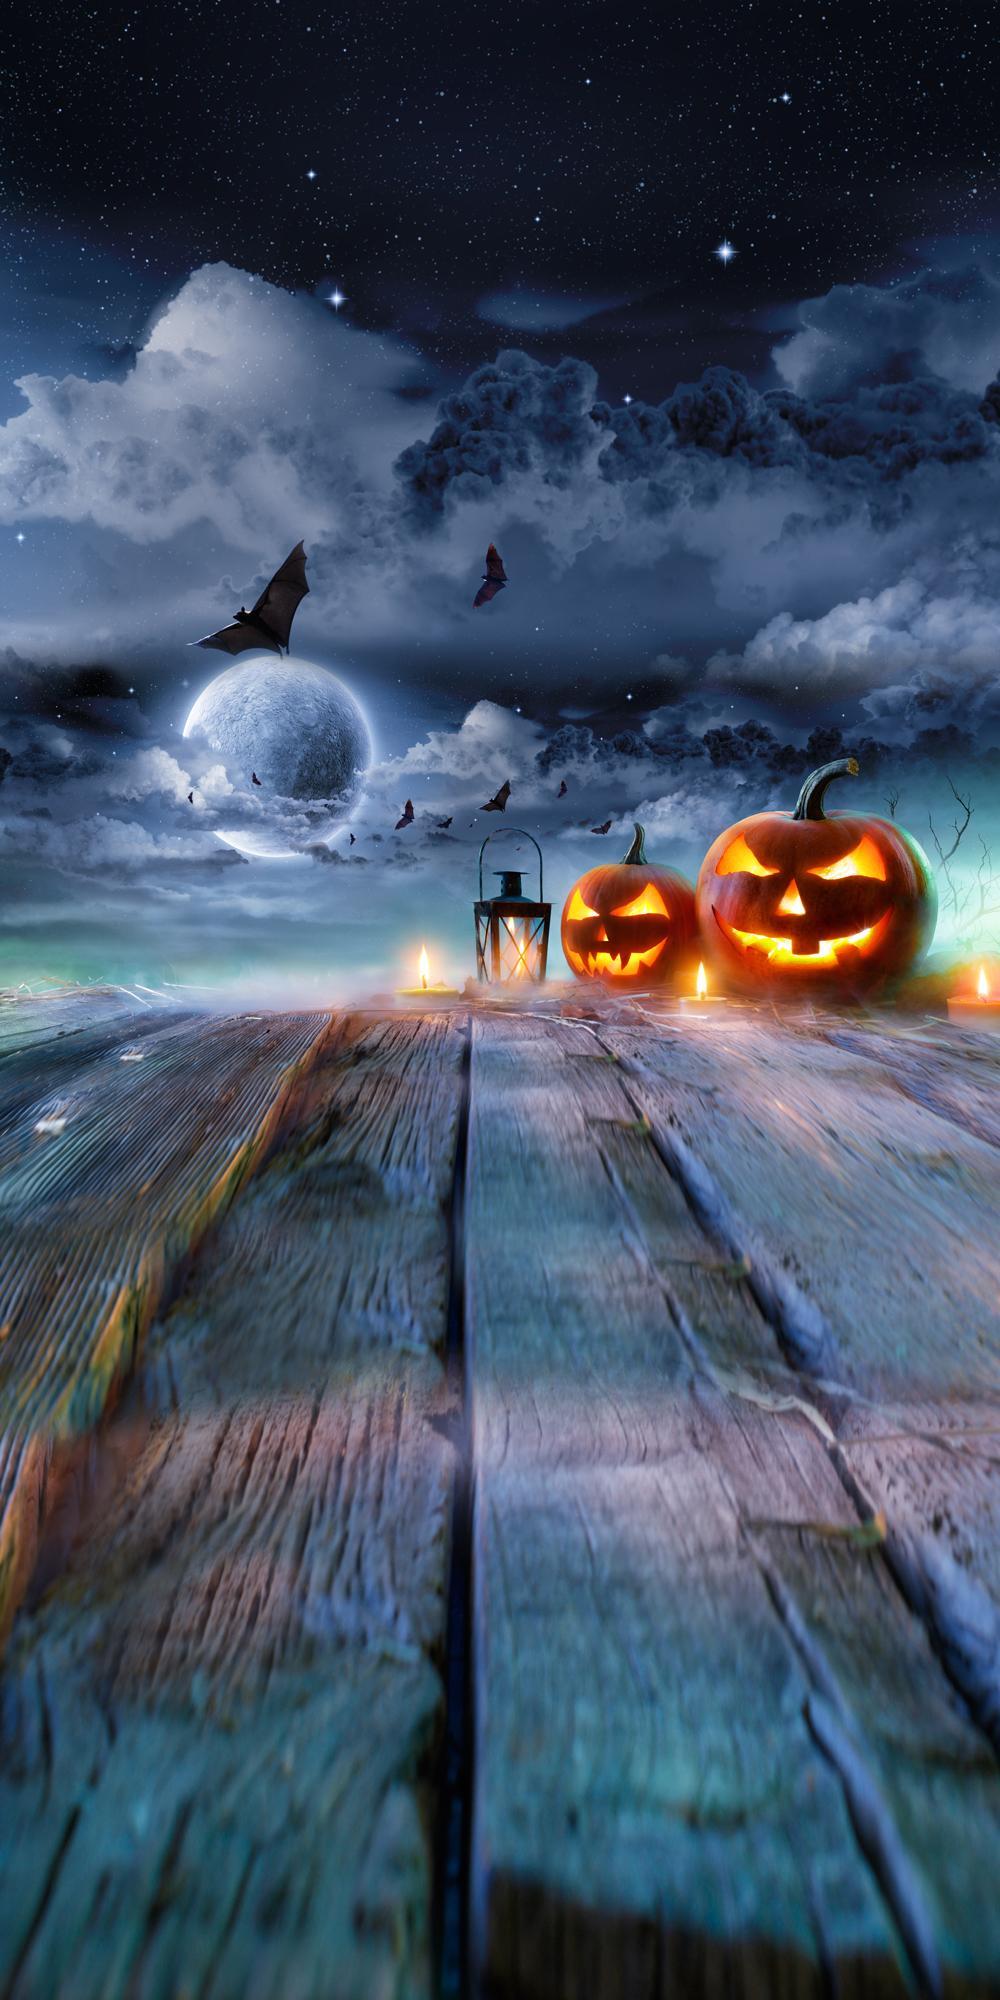 halloween photography Background Pumpkin Lamps moon bats wood floor photographic Backdrop Photo Prop halloween backdrop XT-6341